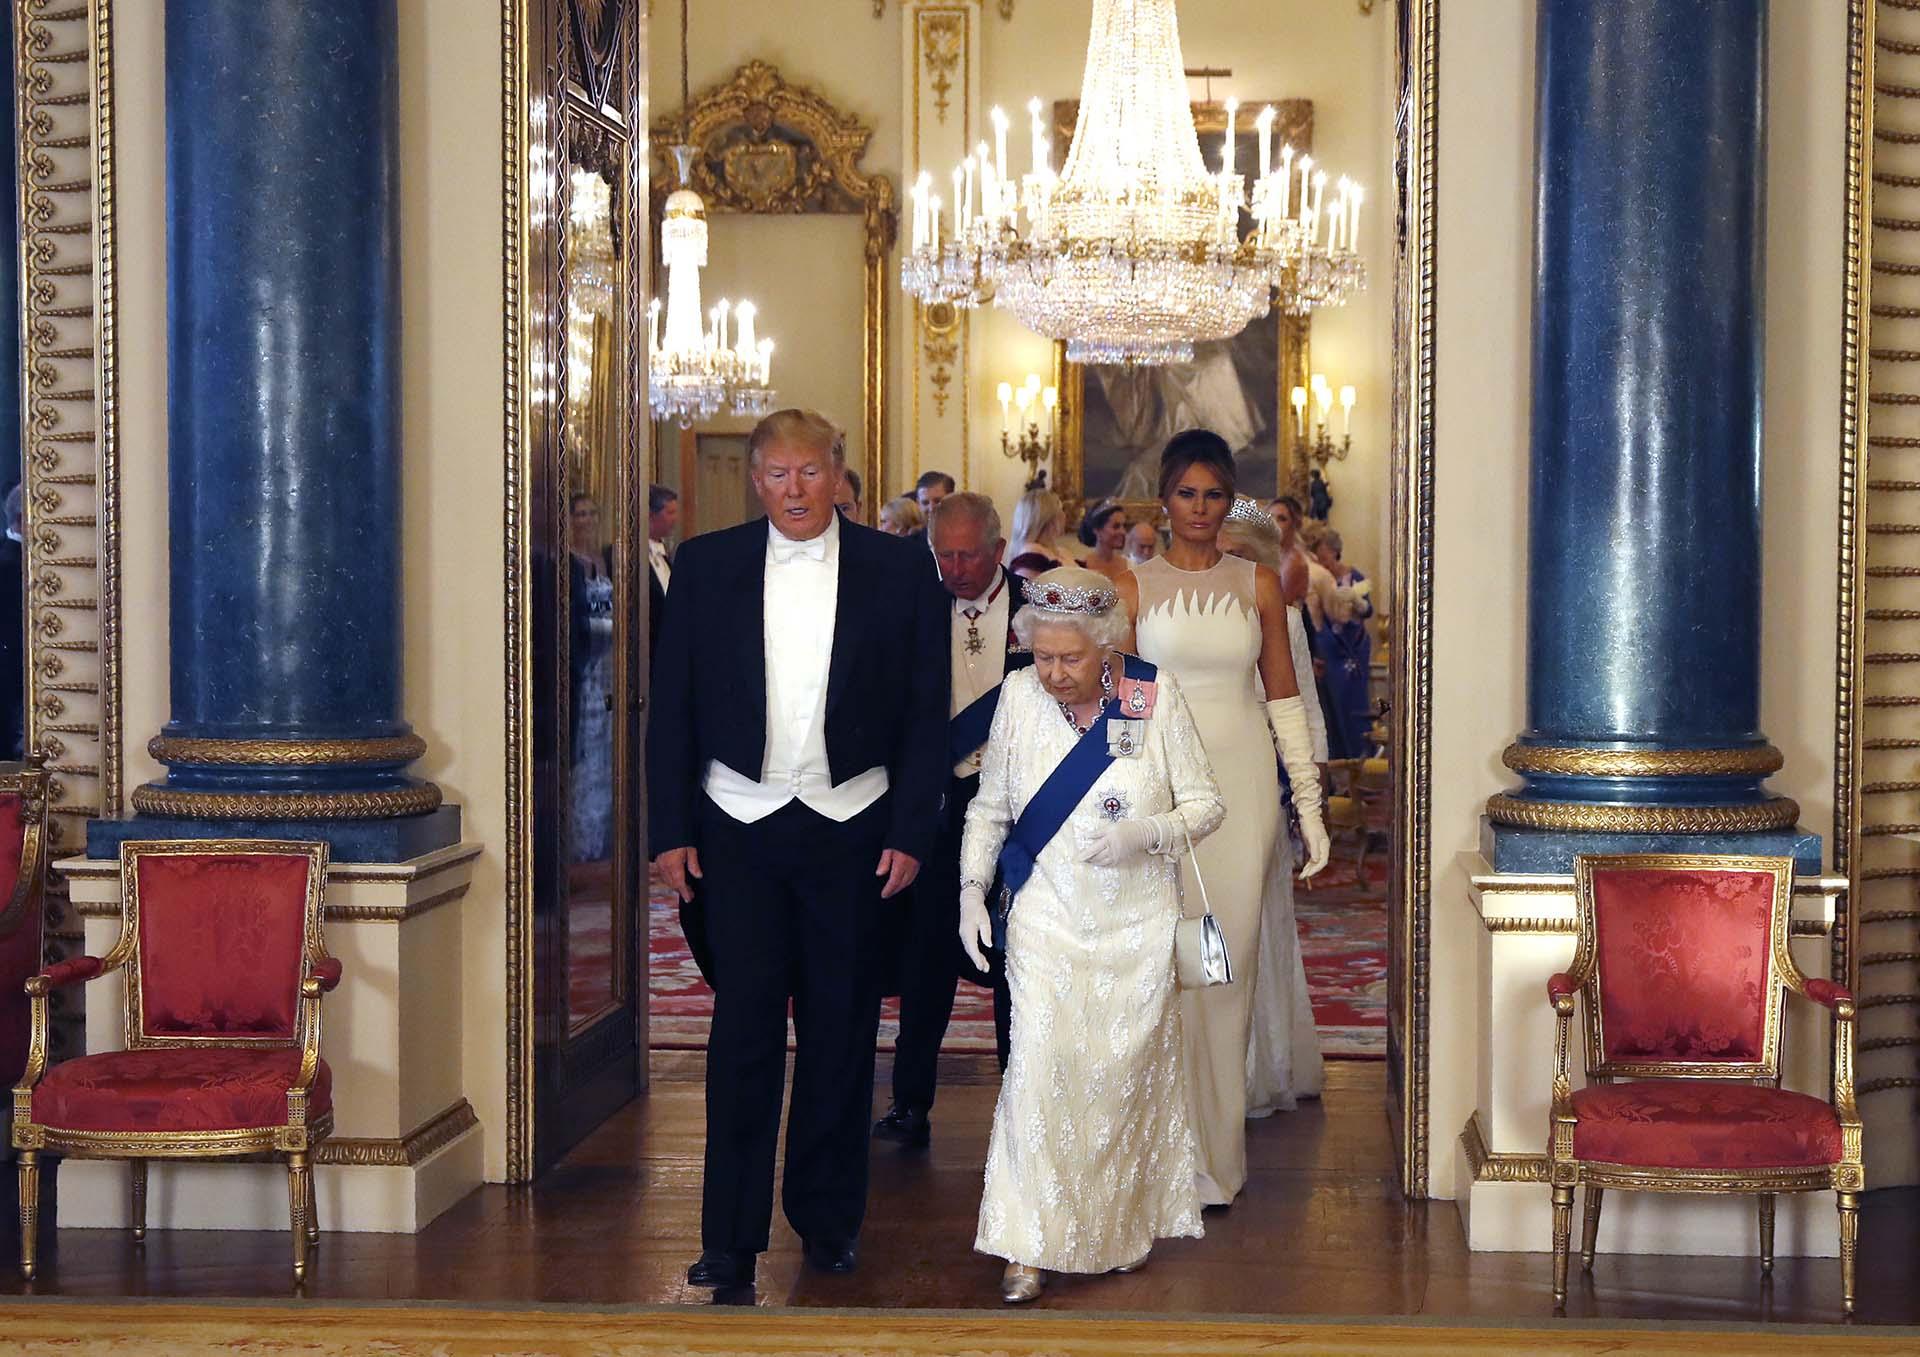 (Alastair Grant/ POOL/ AFP)